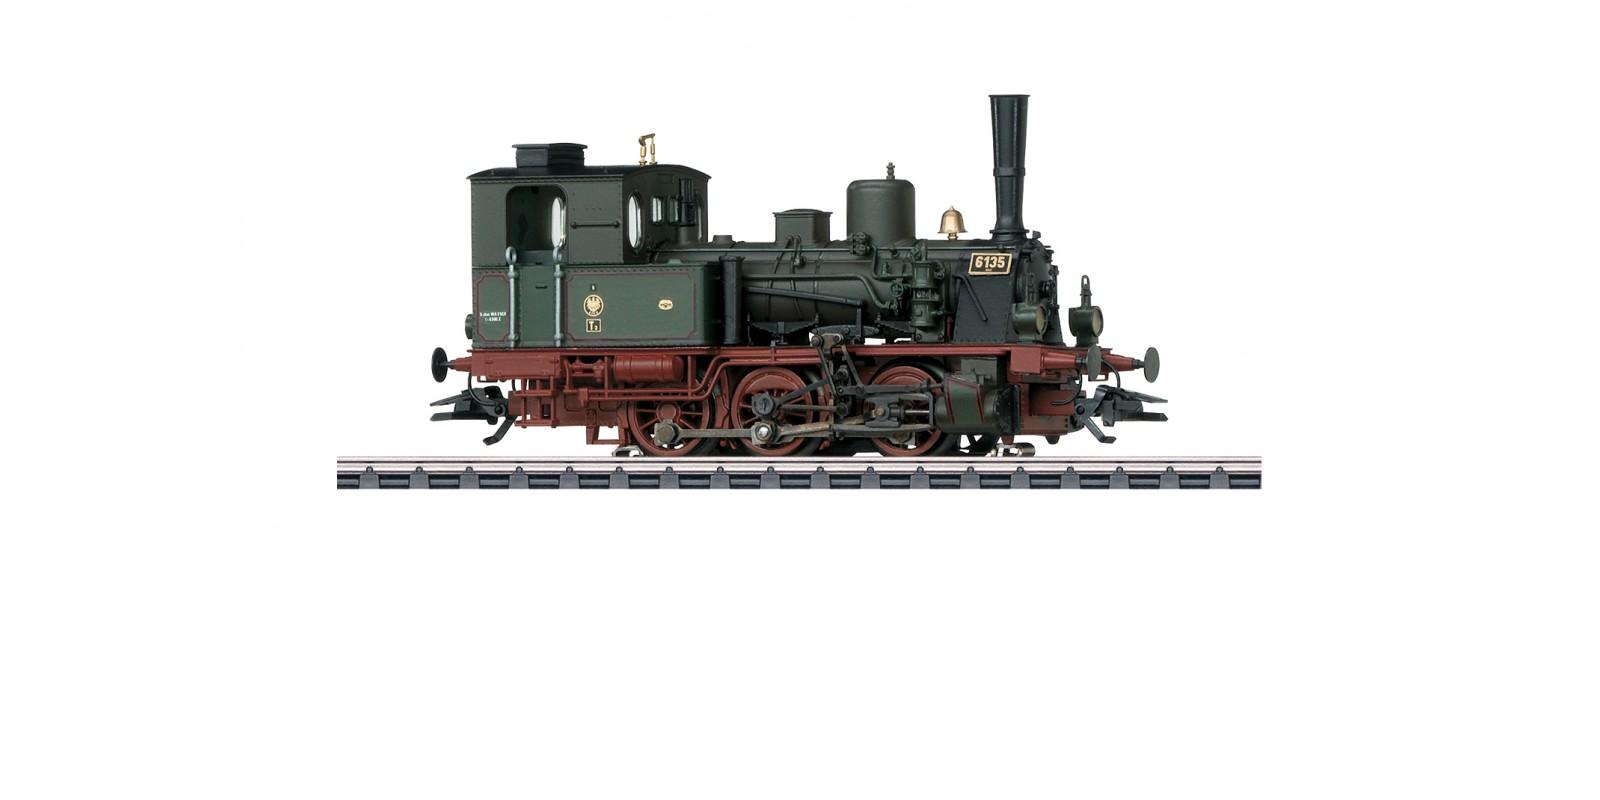 37148 Class T 3 Steam Locomotive